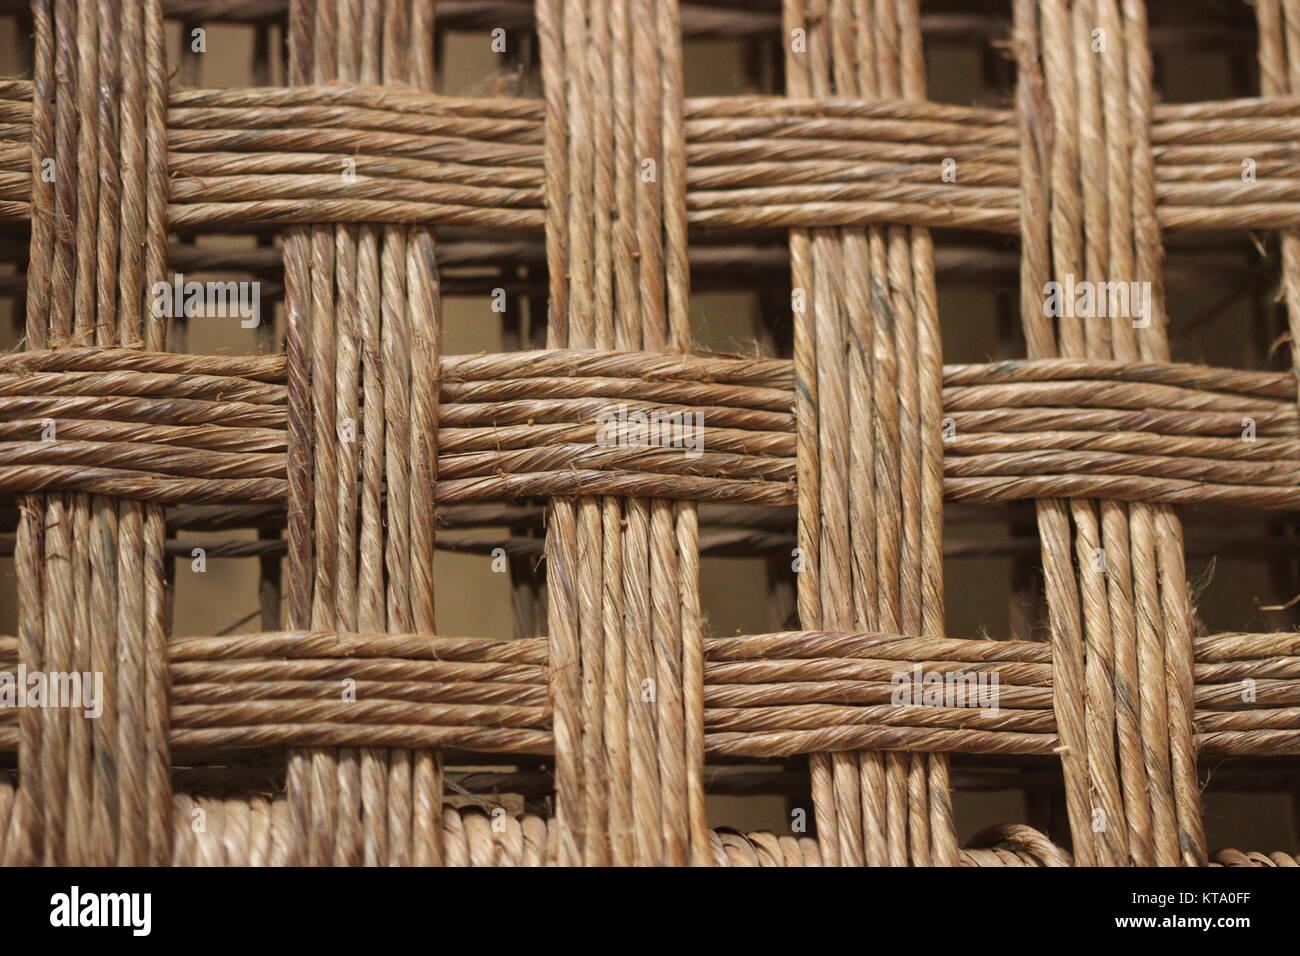 Entrelazado con patrón de madera Imagen De Stock